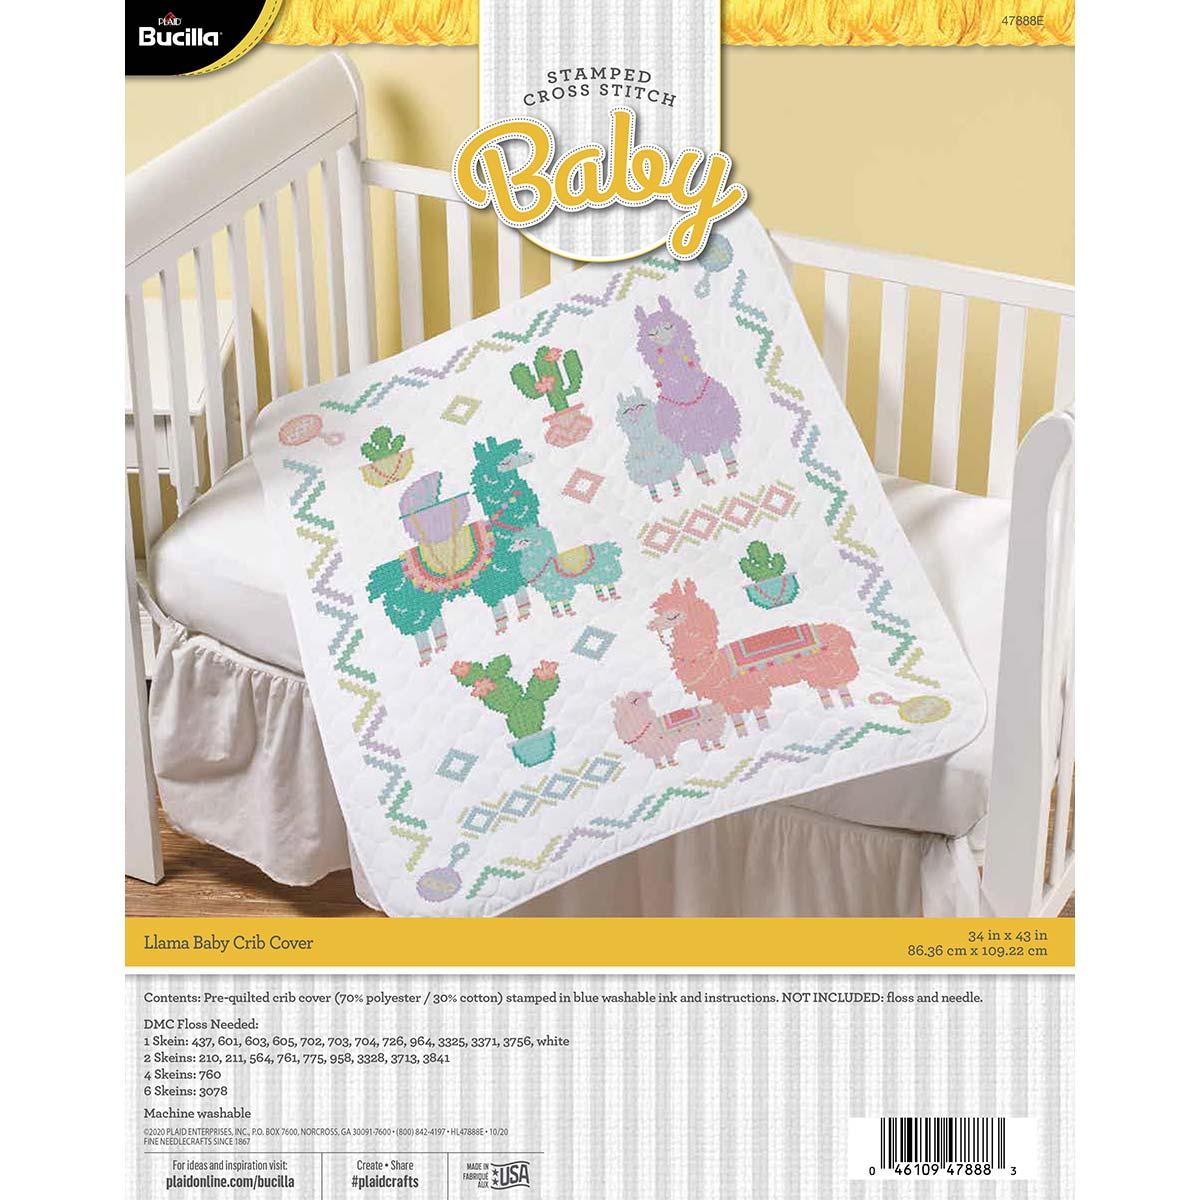 Bucilla ® Baby - Stamped Cross Stitch - Crib Ensembles - Llama Baby - Crib Cover - 47888E